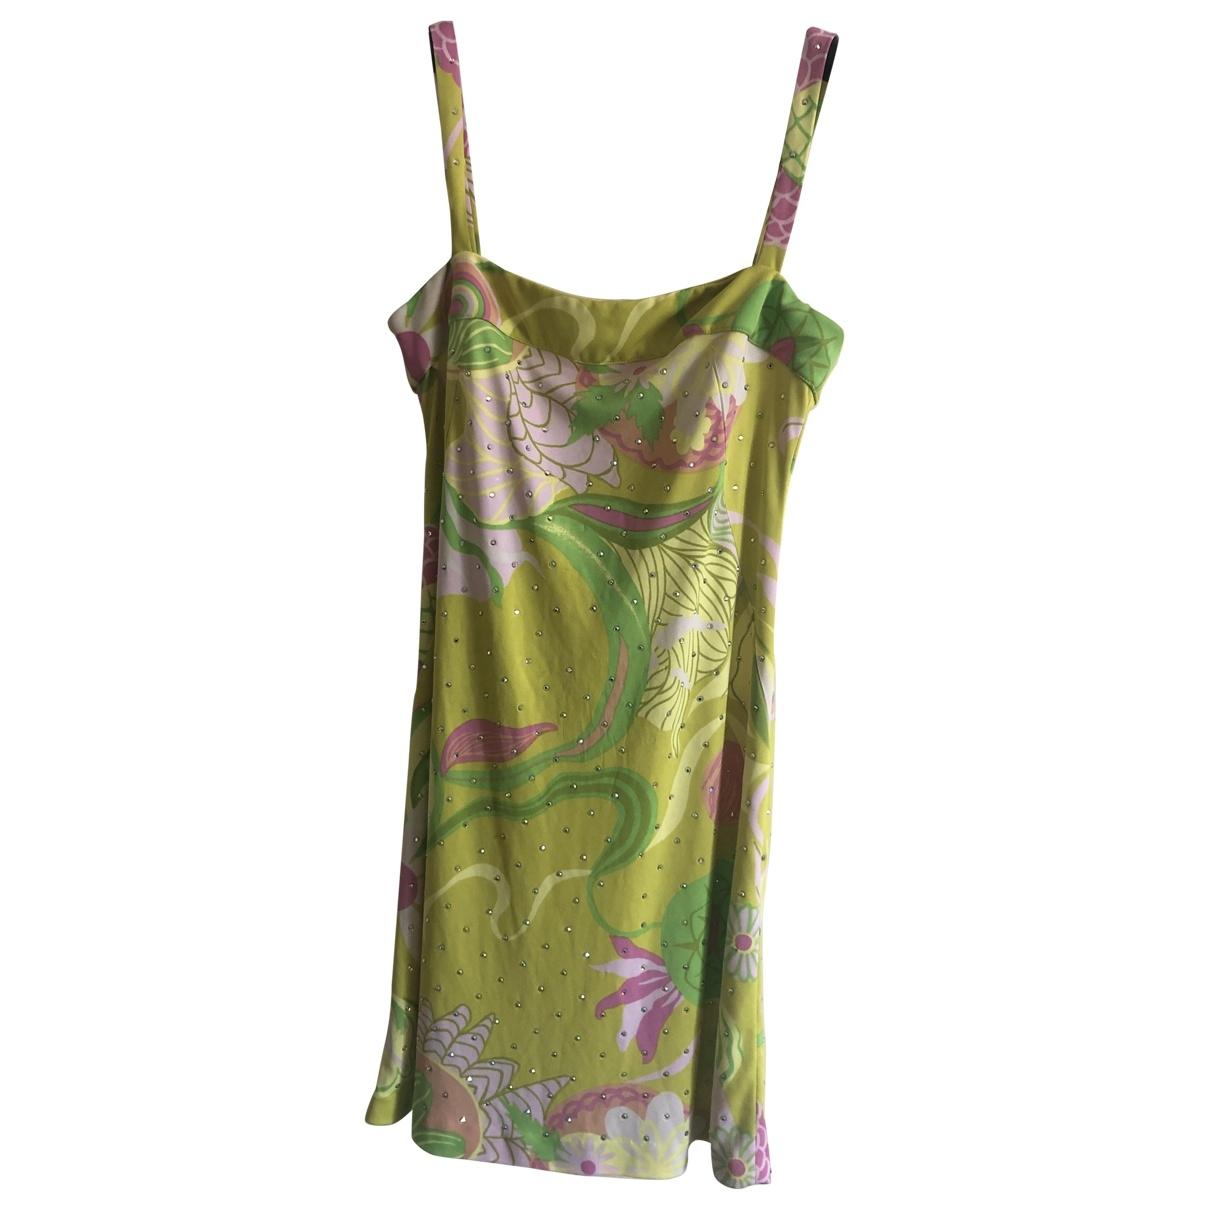 D&g \N Green Glitter dress for Women 44 IT